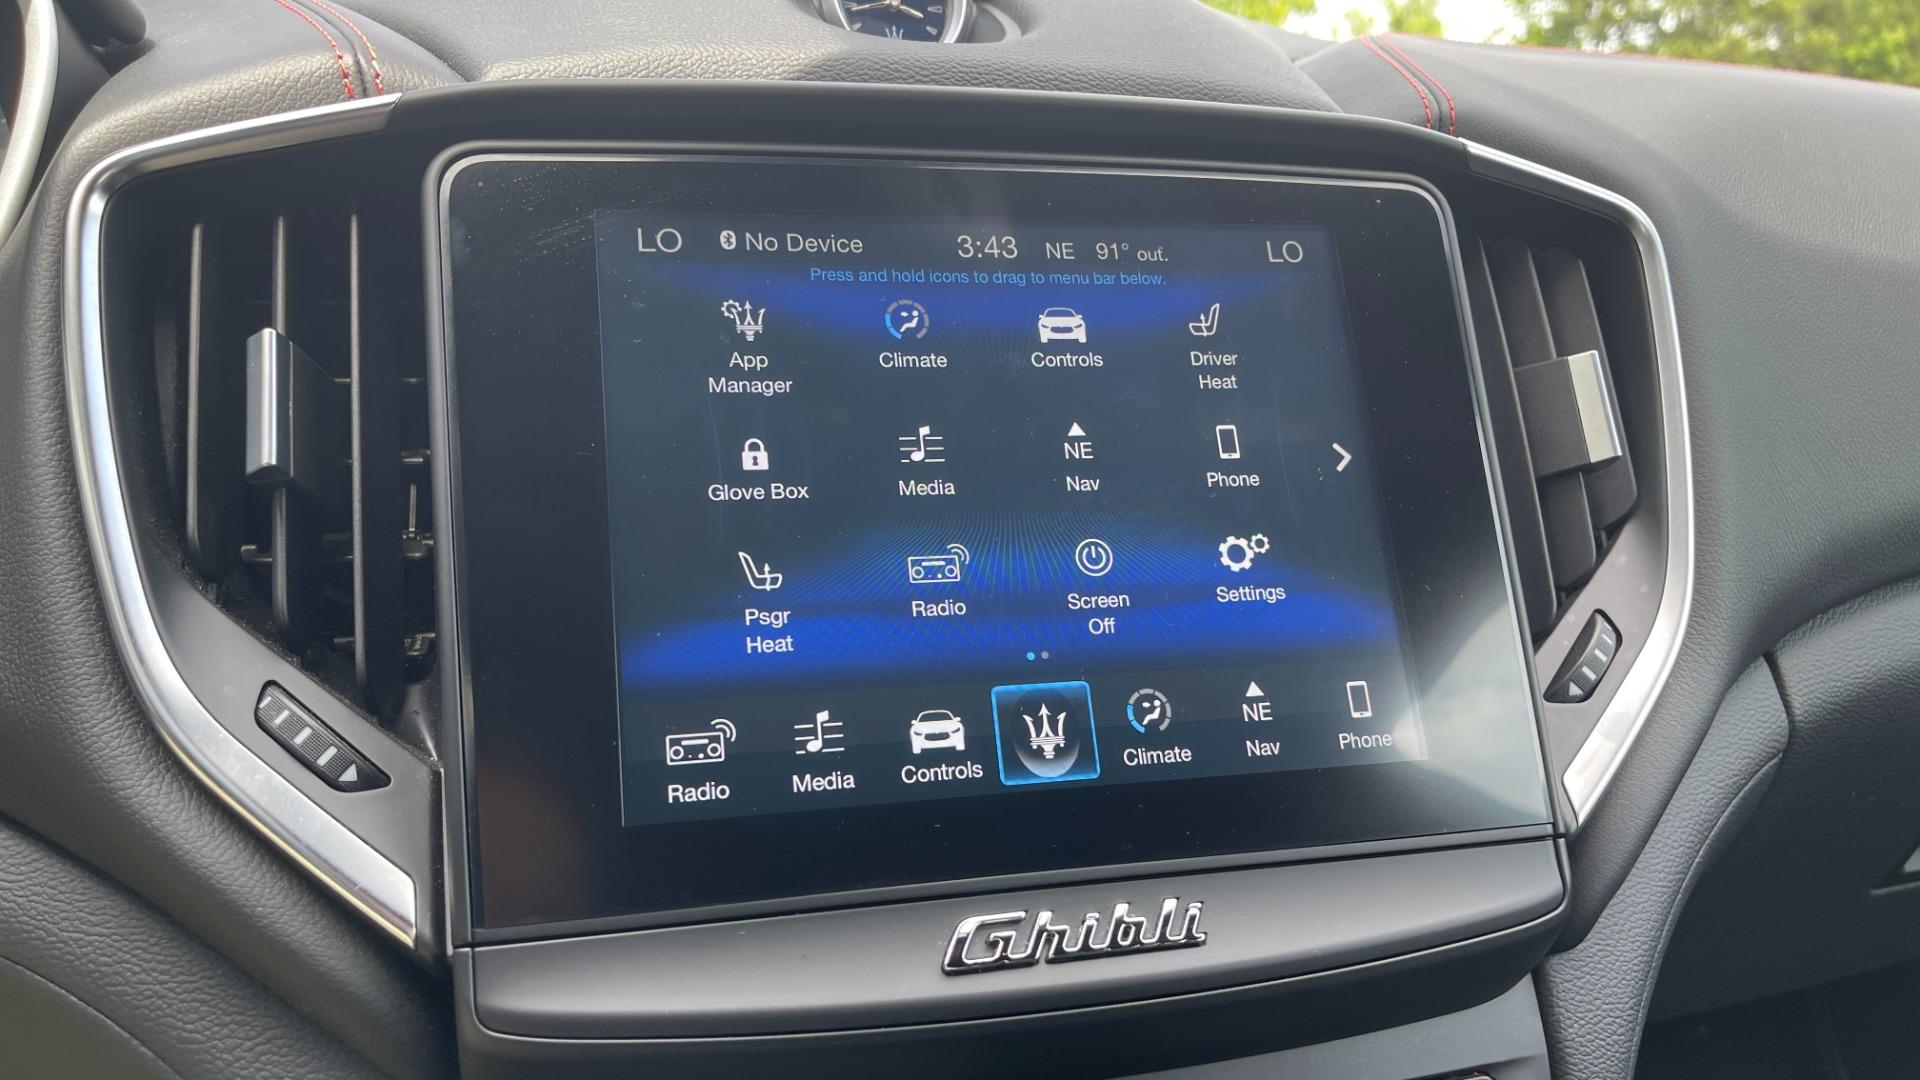 Used 2018 Maserati GHIBLI S Q4 SEDAN / AWD / 3.0L V6 / SUNROOF / NAV / REARVIEW for sale $51,995 at Formula Imports in Charlotte NC 28227 38